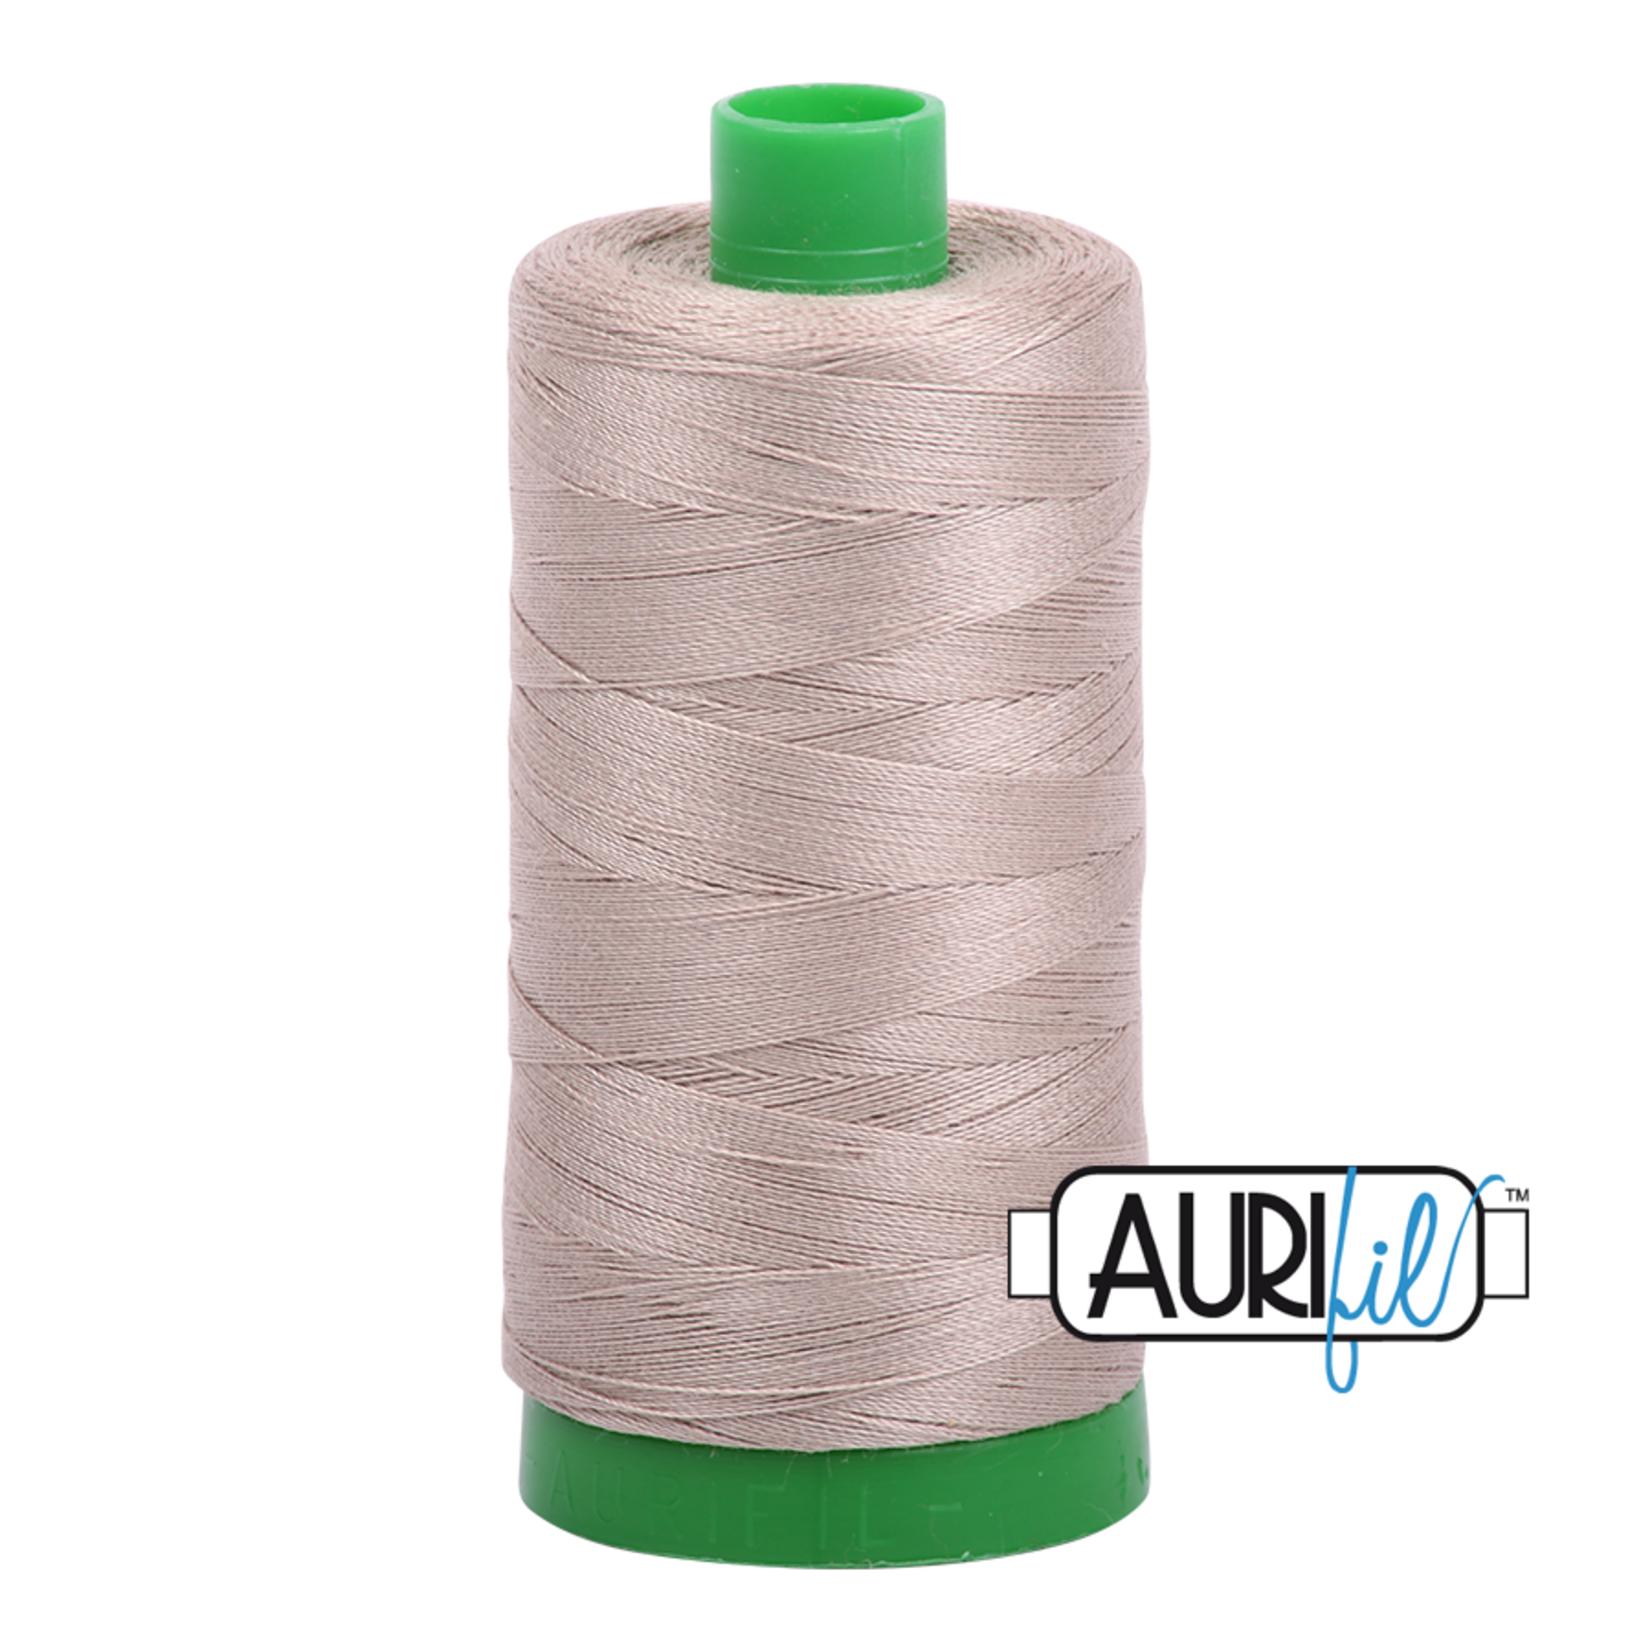 AURIFIL AURIFIL 40 WT Rope Beige 5011